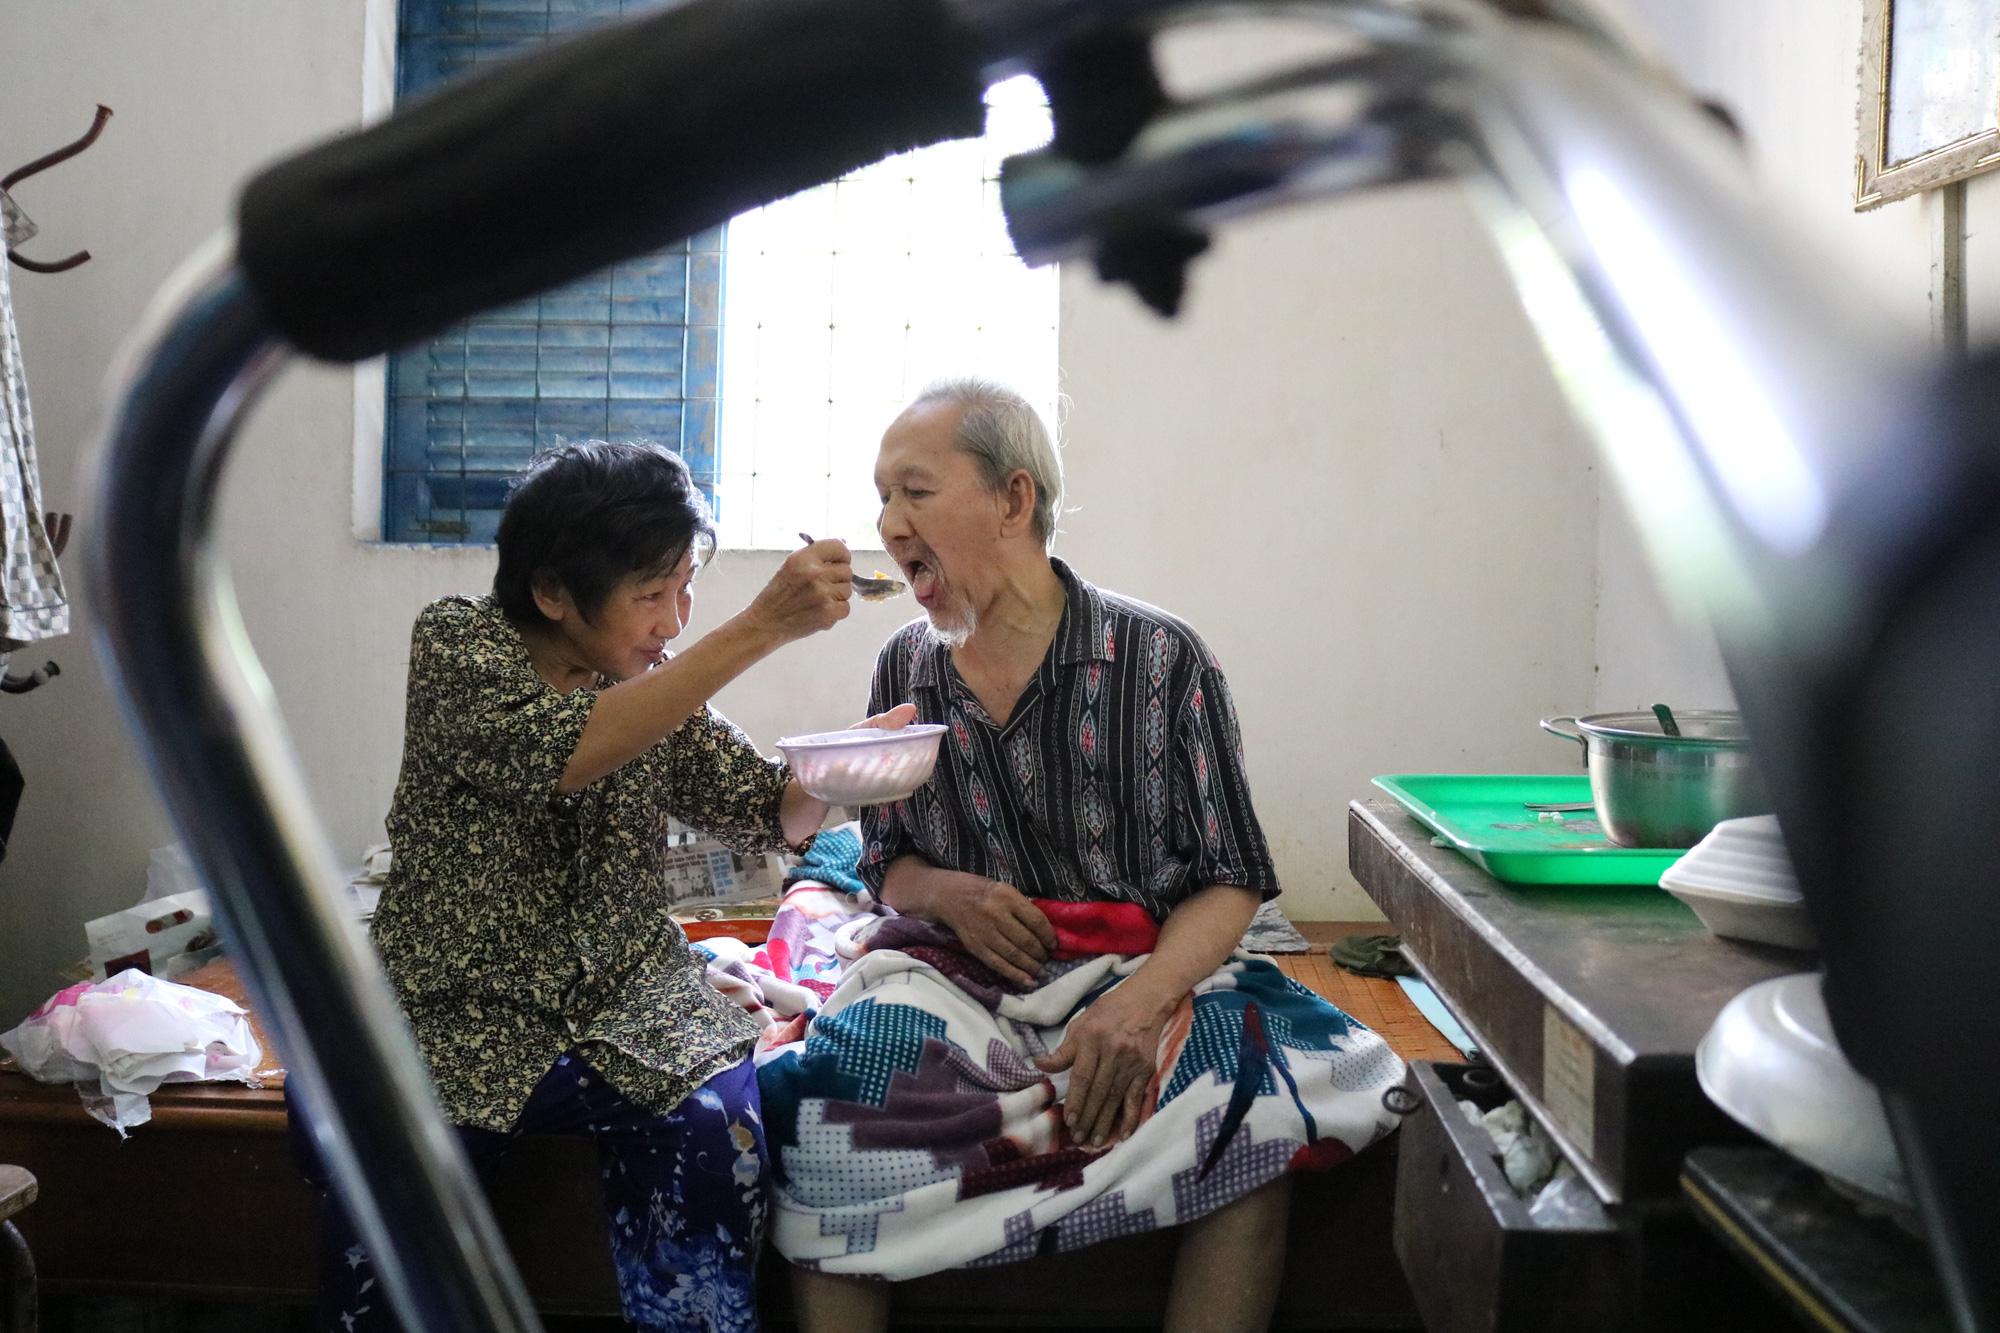 Ho Chi Minh City septuagenarian vendor fends for leper husband, 5 children for 16 years